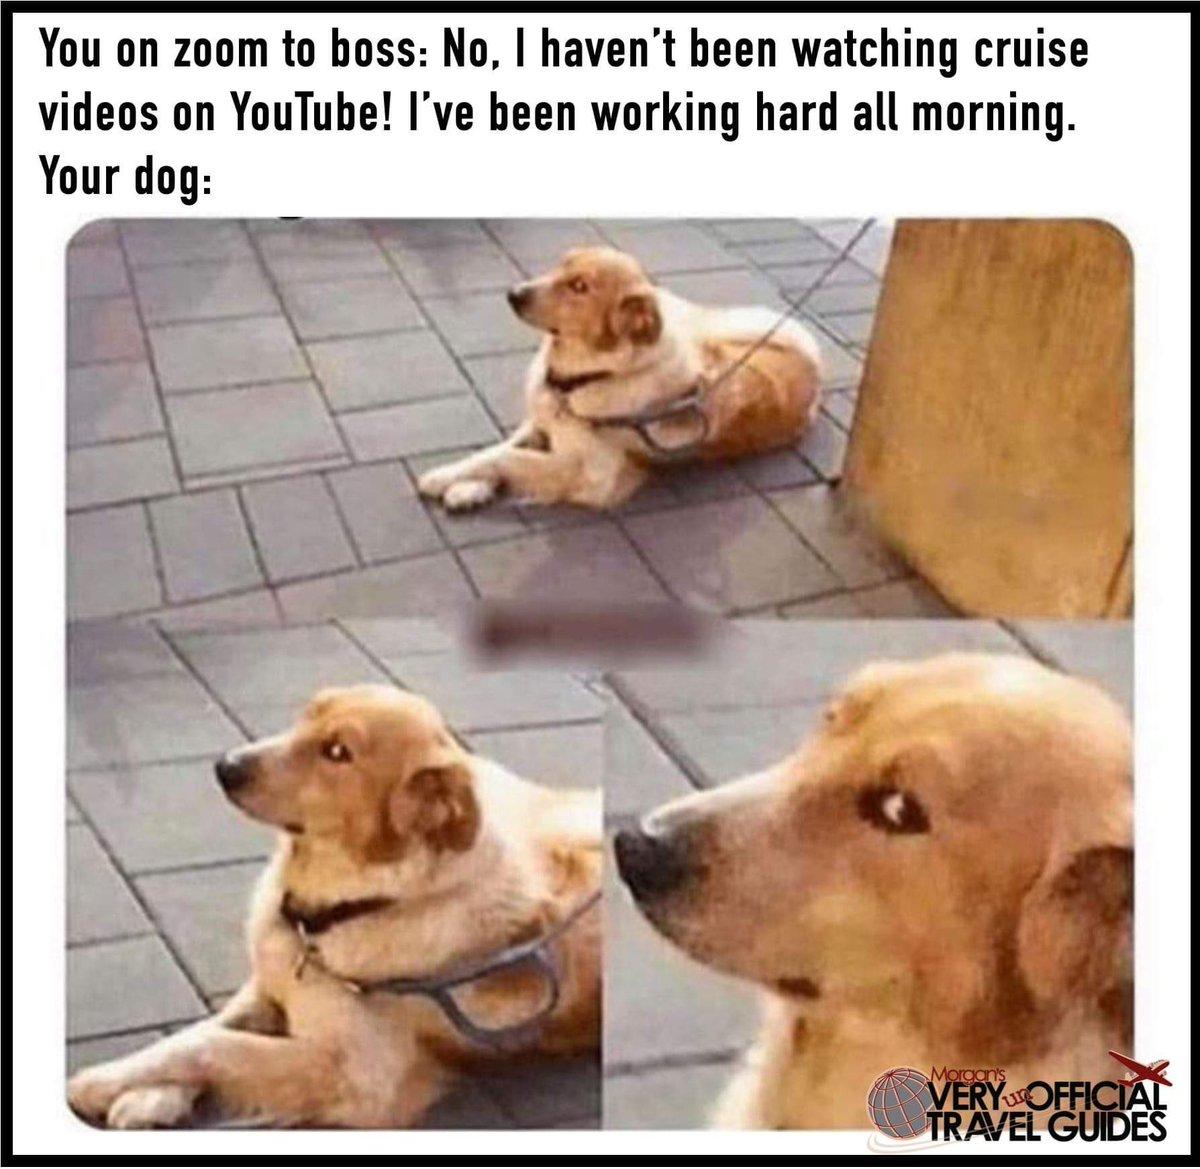 Definitely guilty. #cruise #cruiseship #zoommeeting #dogmemepic.twitter.com/Bvpdp6Ip2X